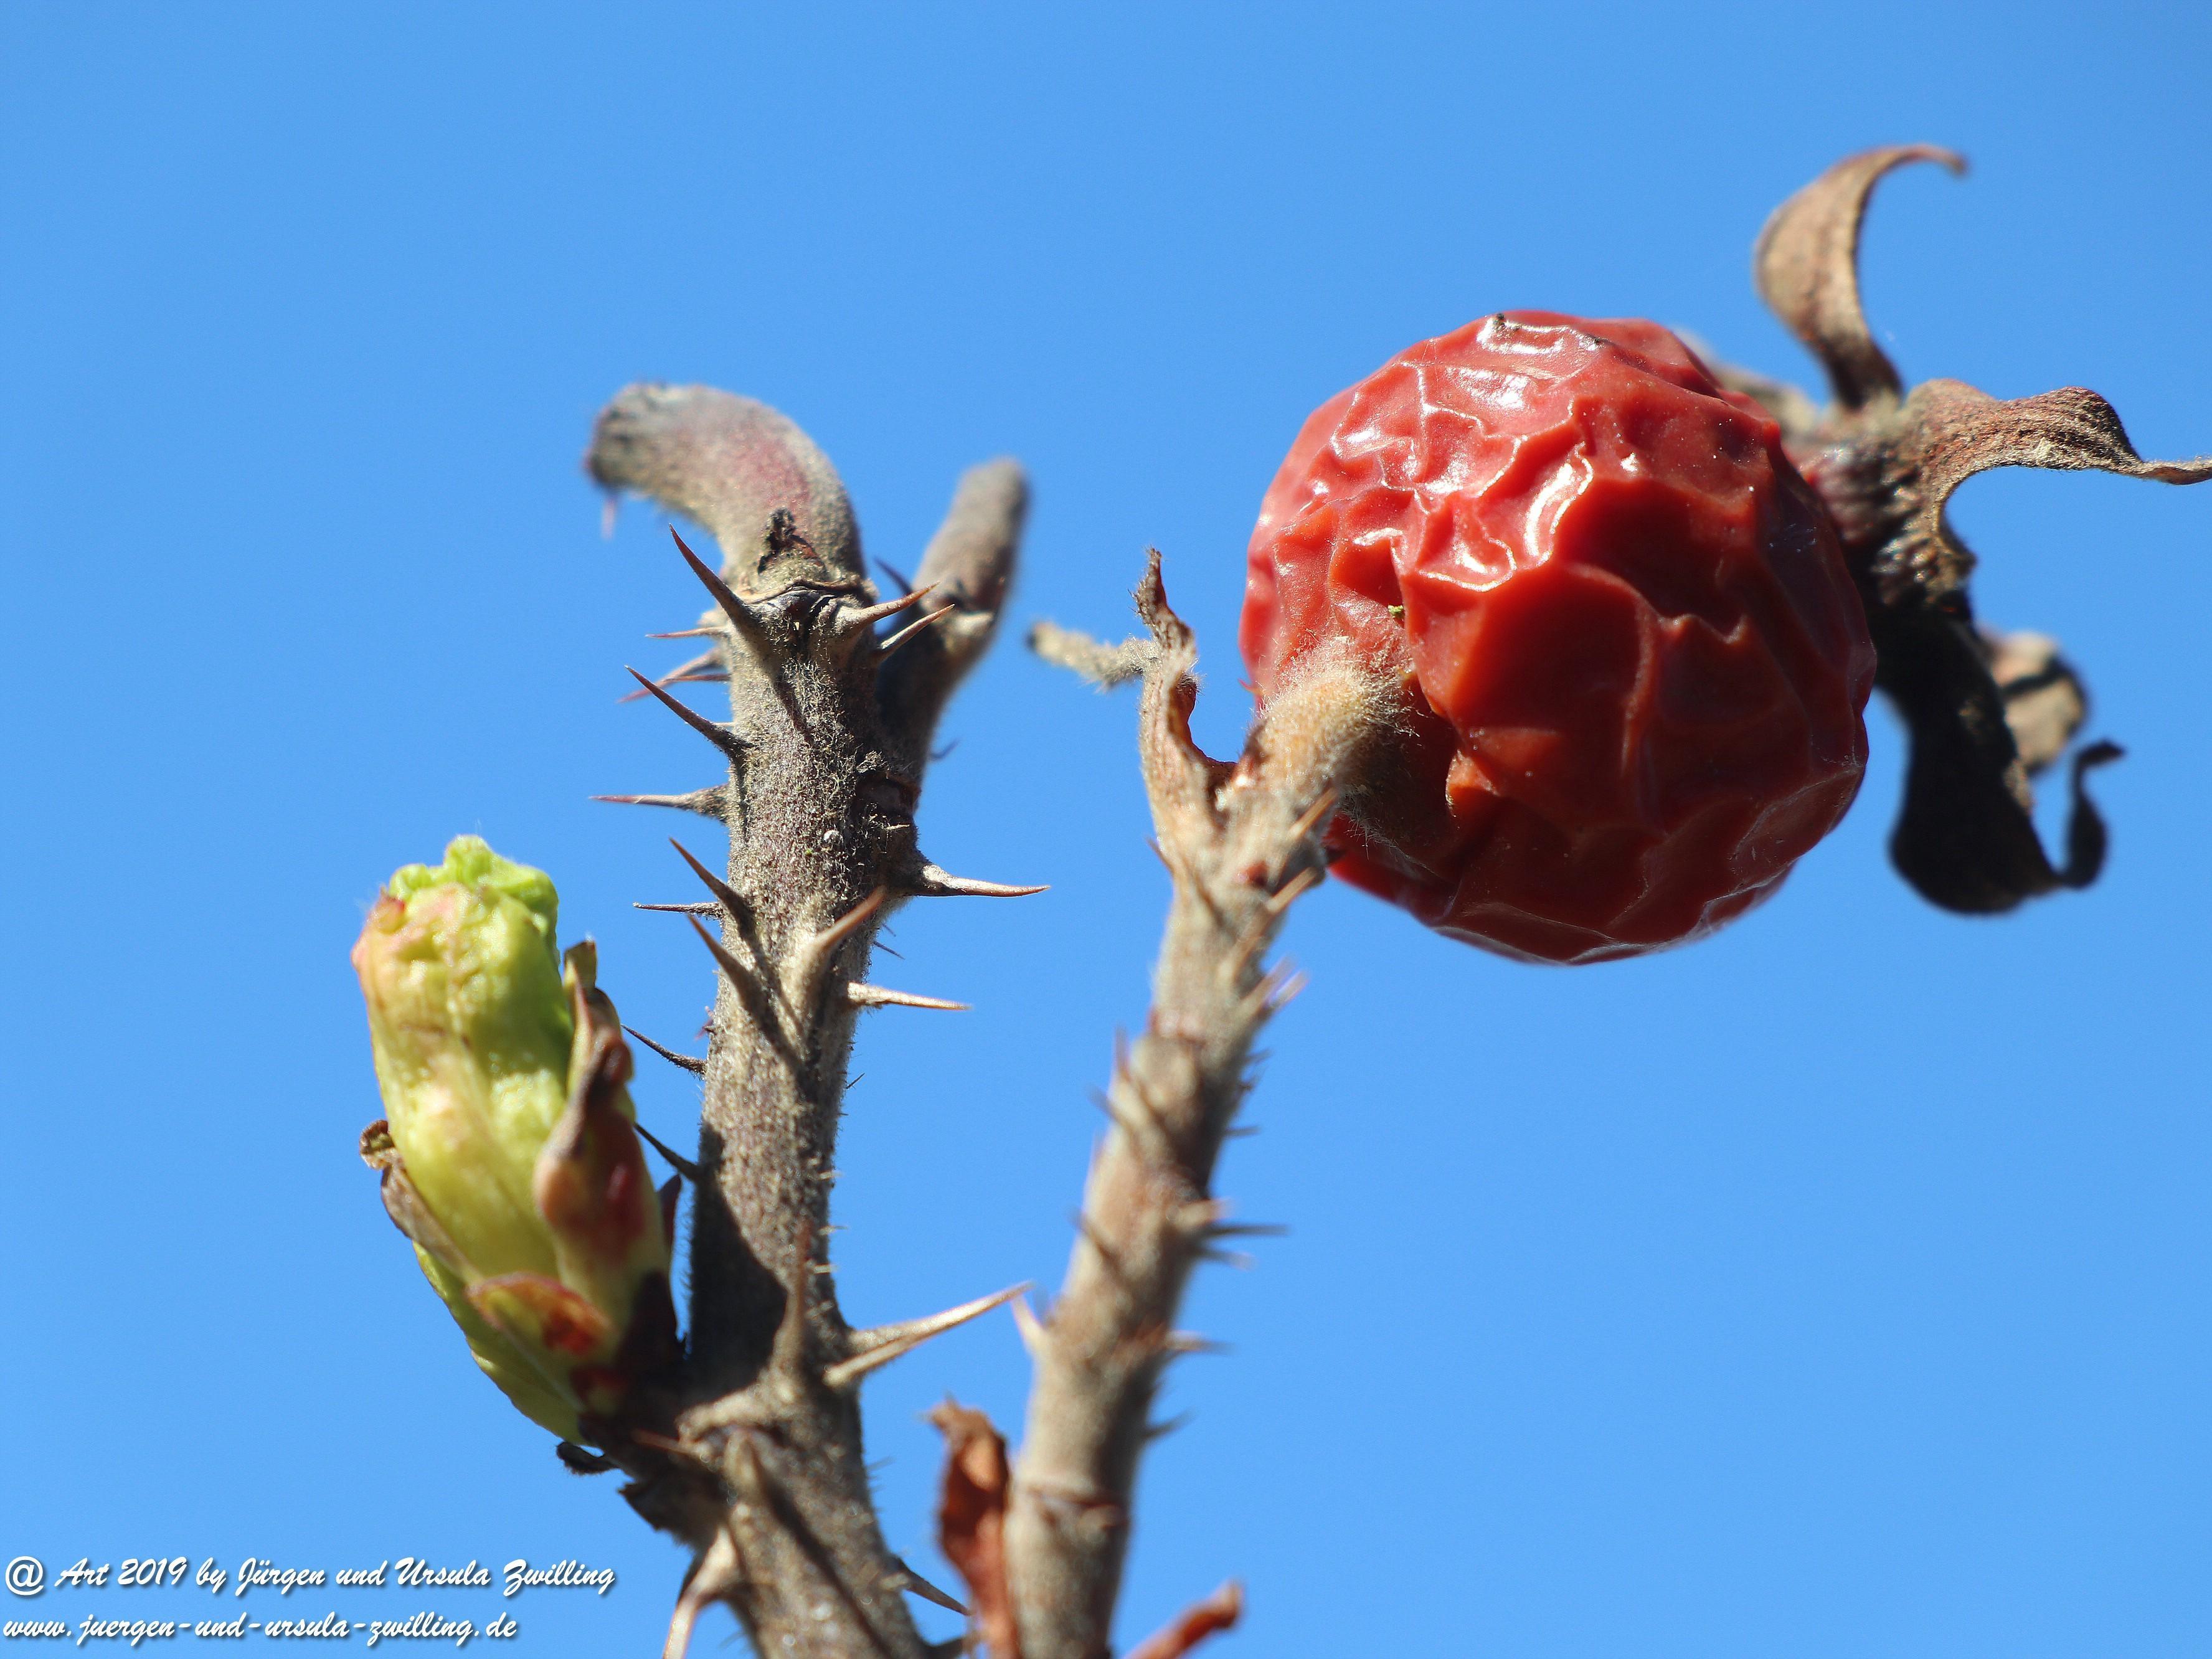 Herbst - Frühling 2